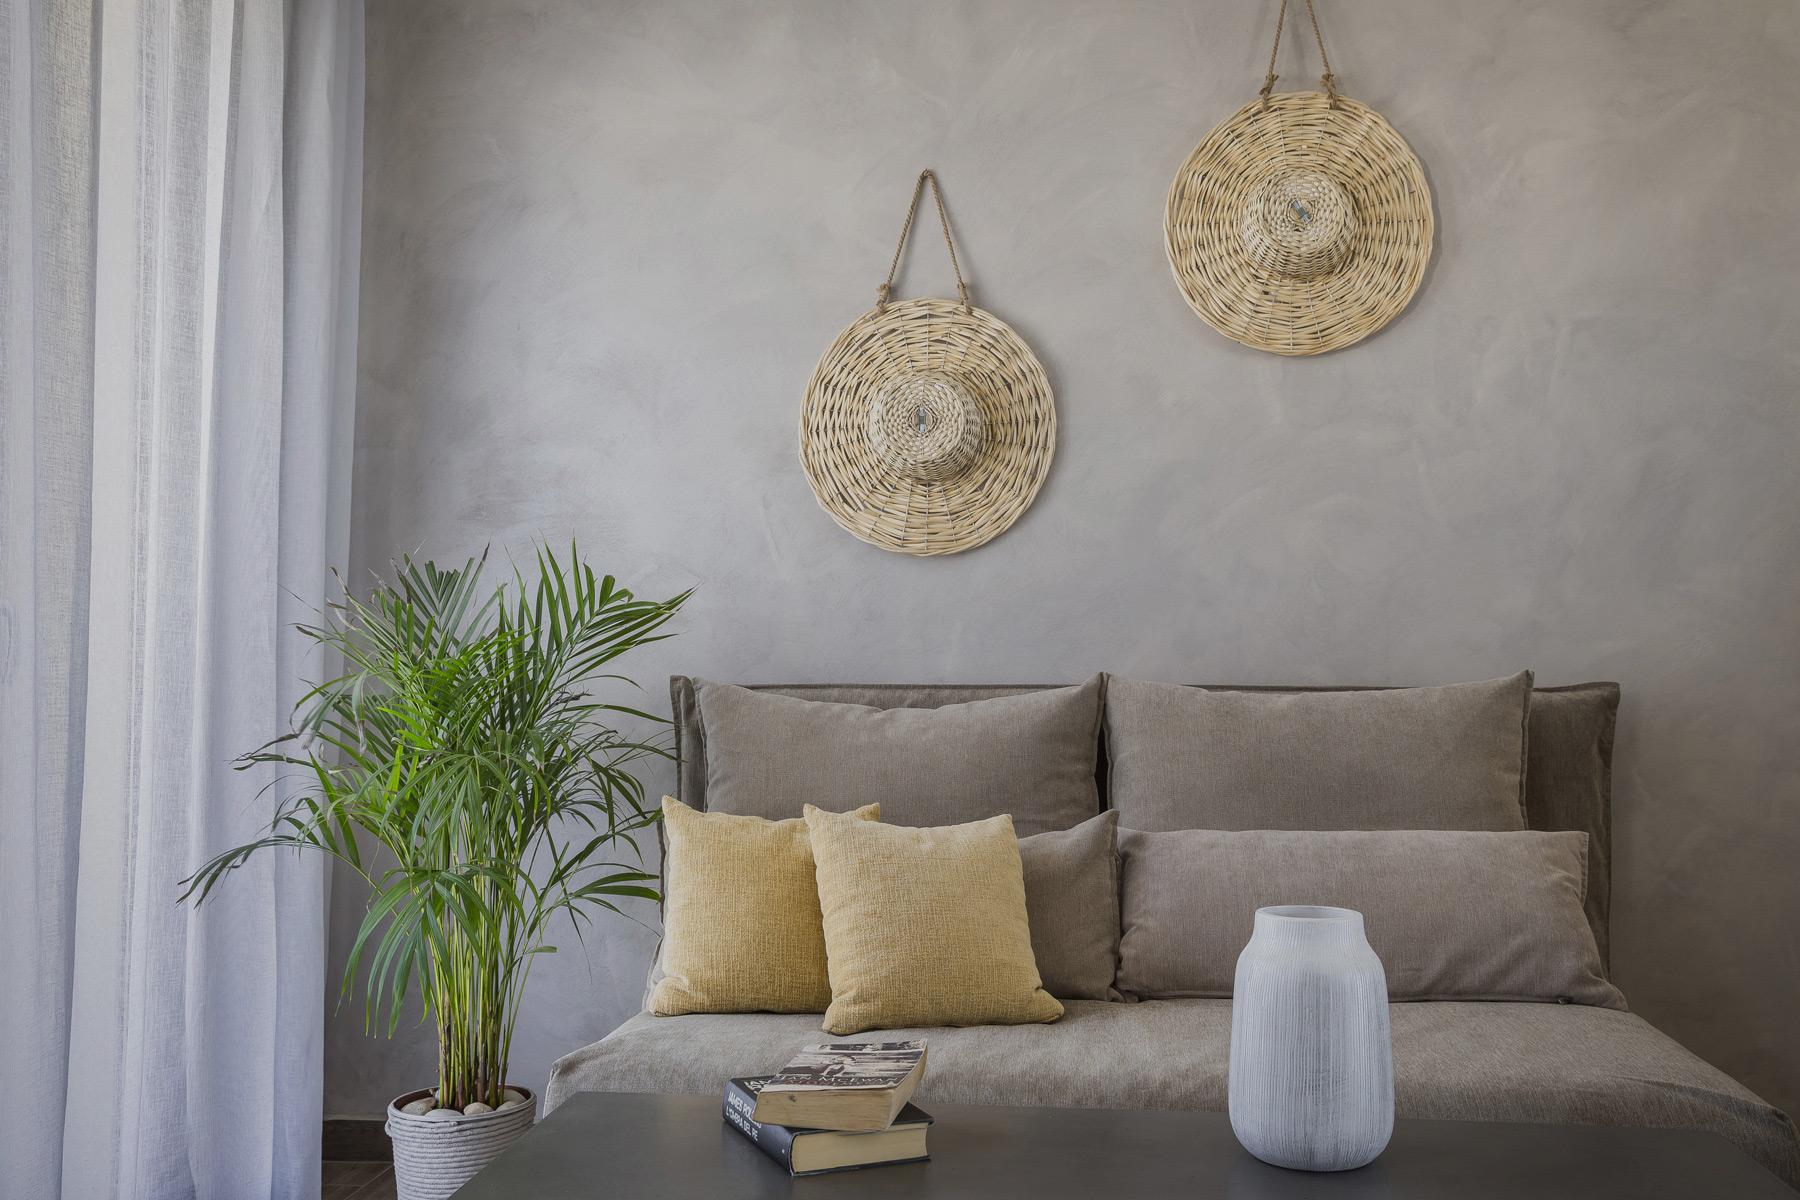 kefalonia_luxury_apartments_GALLERY